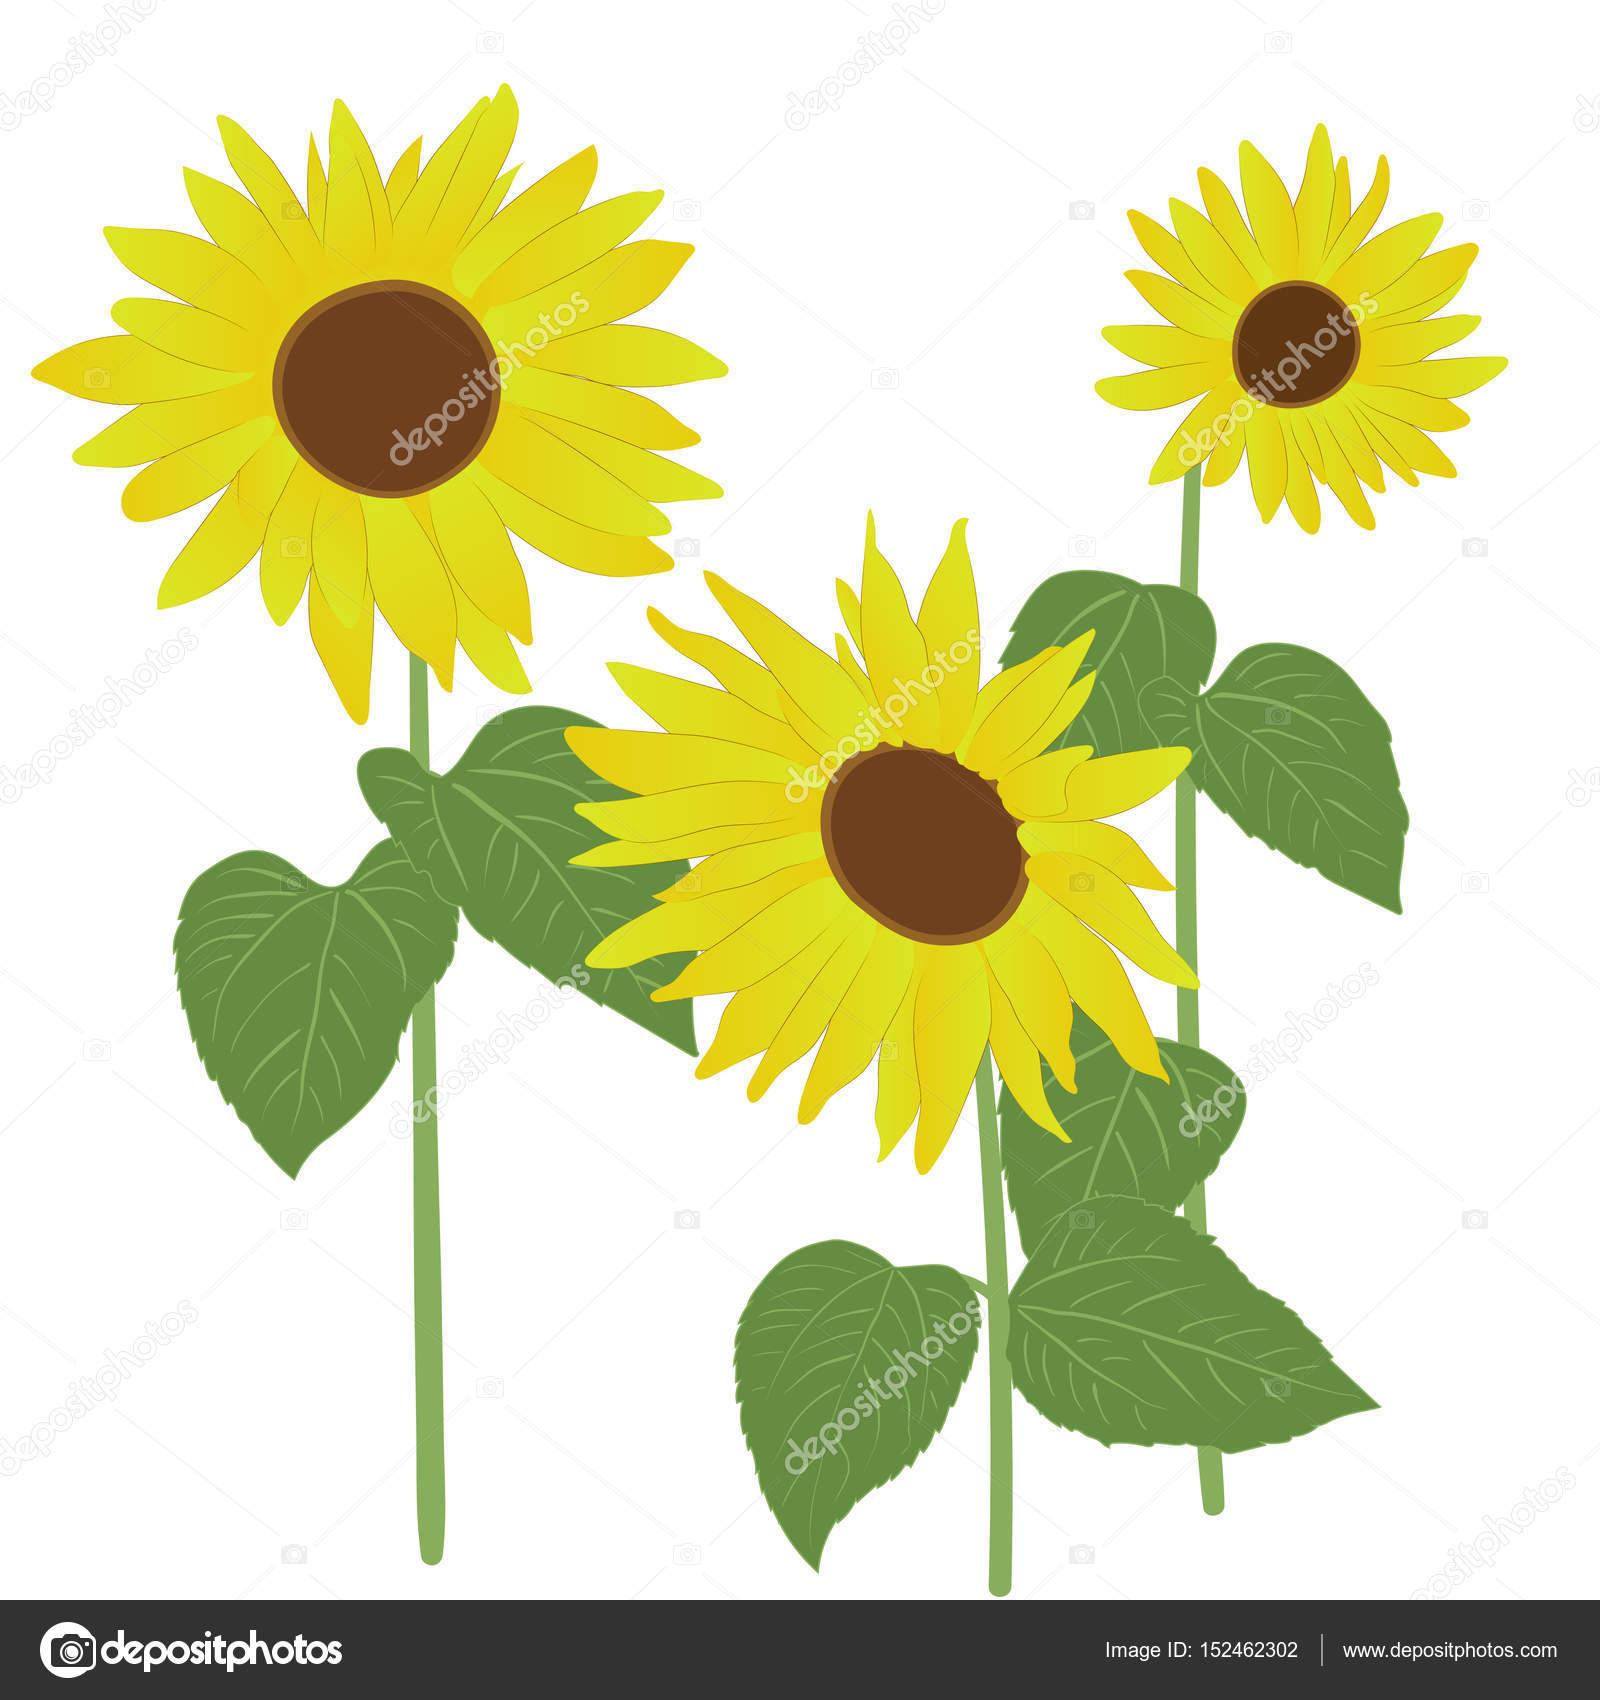 Sonnenblumen drei Blumen — Stockvektor © Baskiwi #152462302